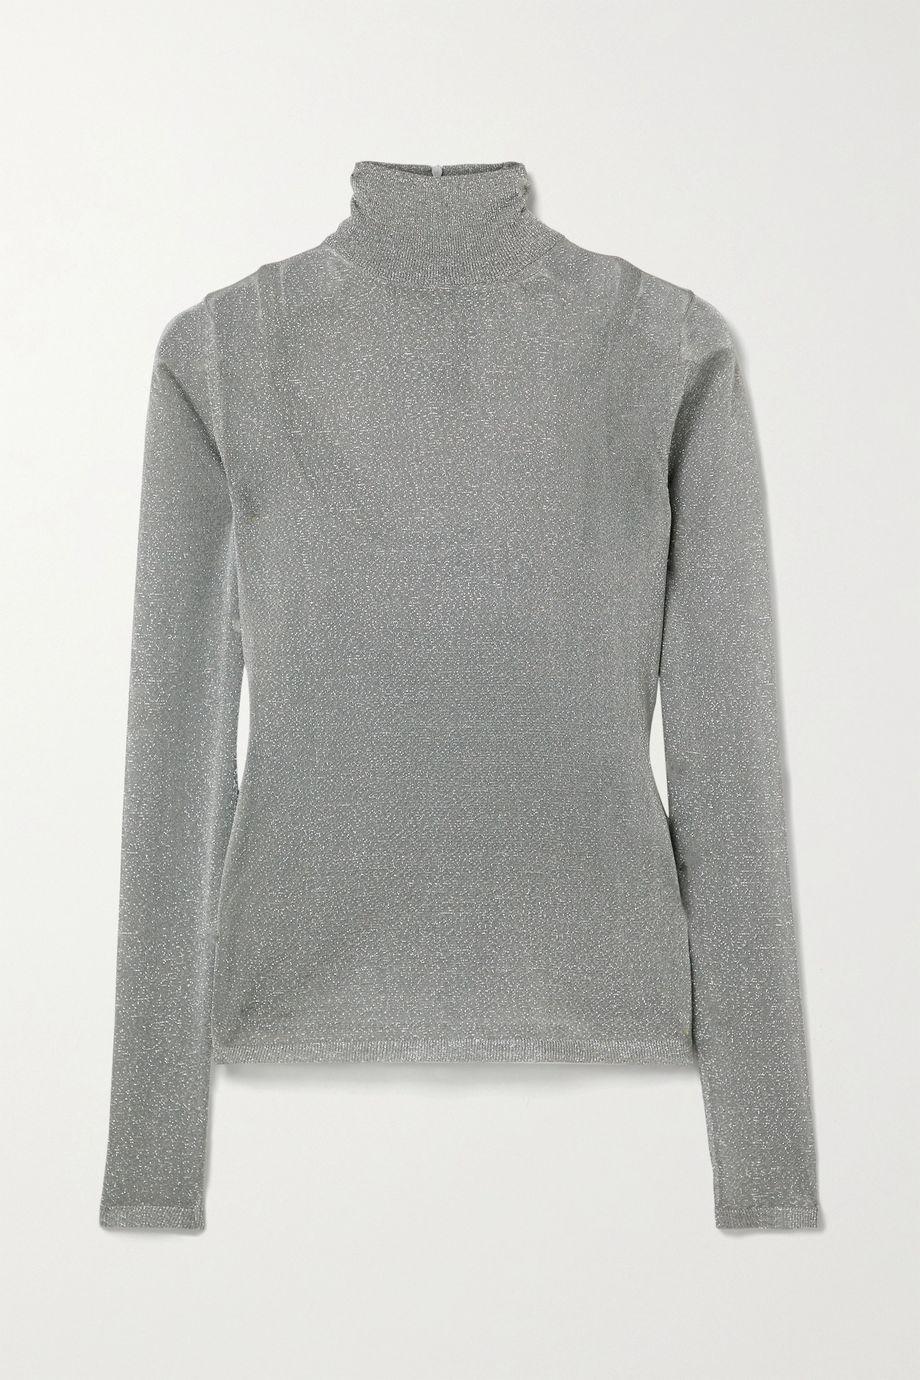 Max Mara Pietra metallic stretch-knit turtleneck sweater